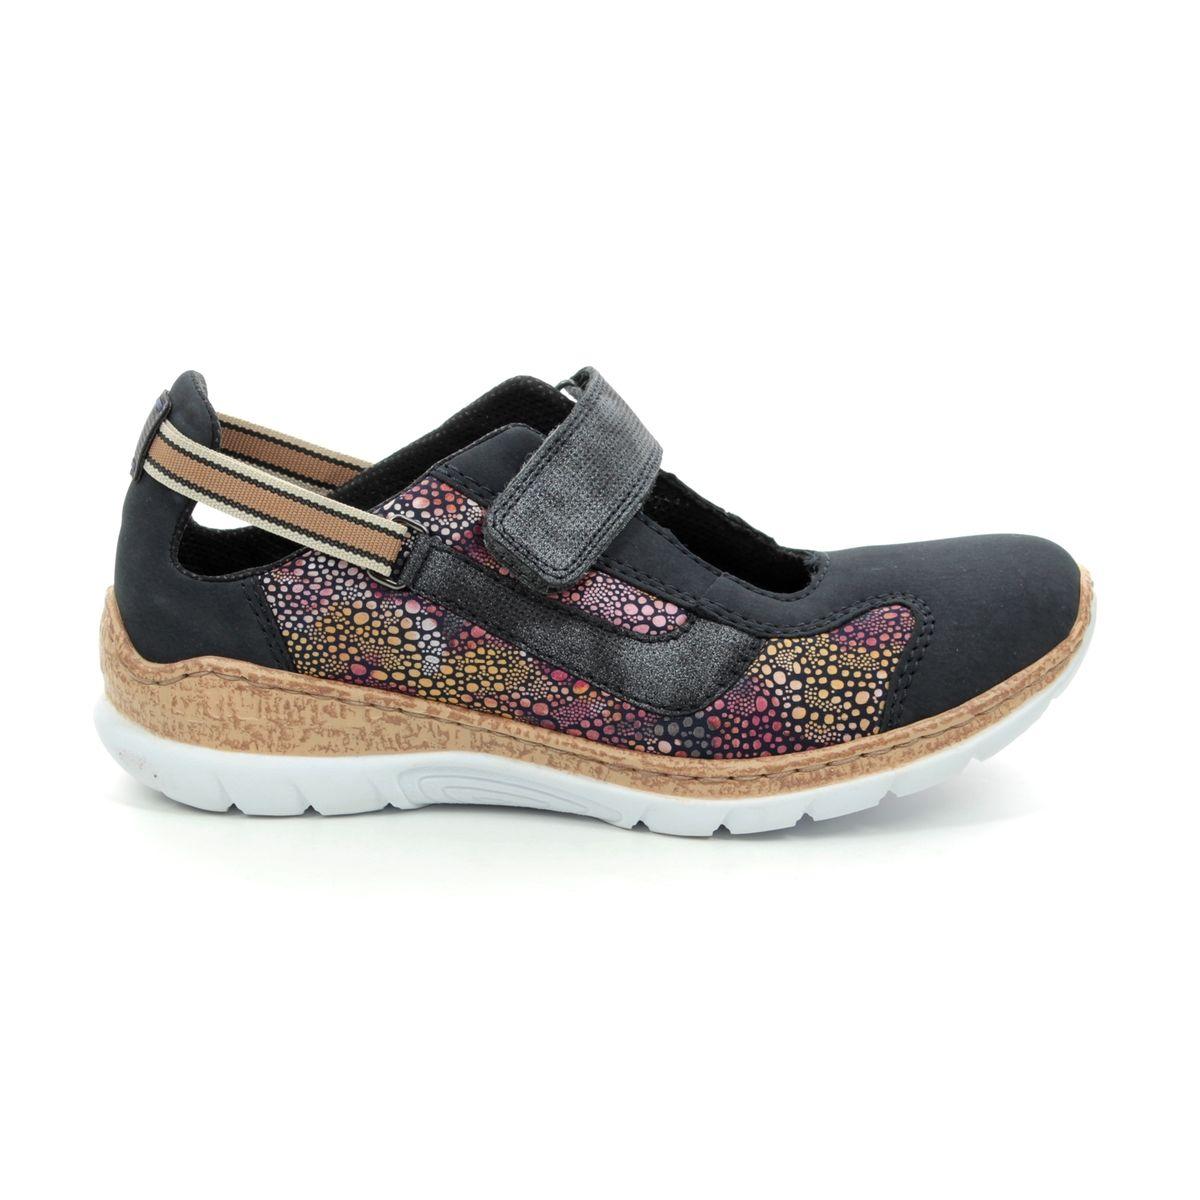 561f57d0d5 Rieker Mary Jane Shoes - Navy multi - N42R8-14 EMPIFLOBAR